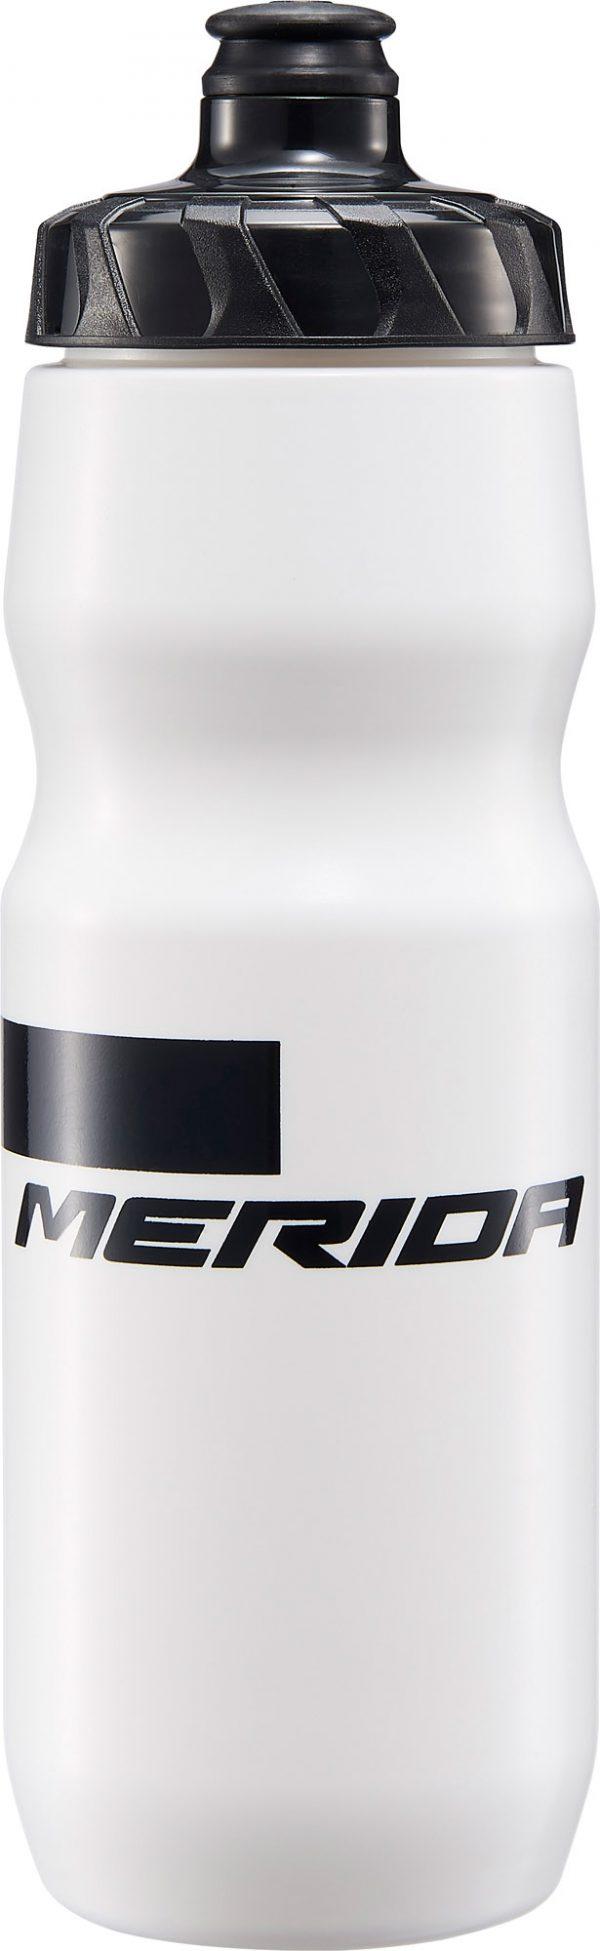 Фляга Merida Bottle/Stripe White, Black 715 мл